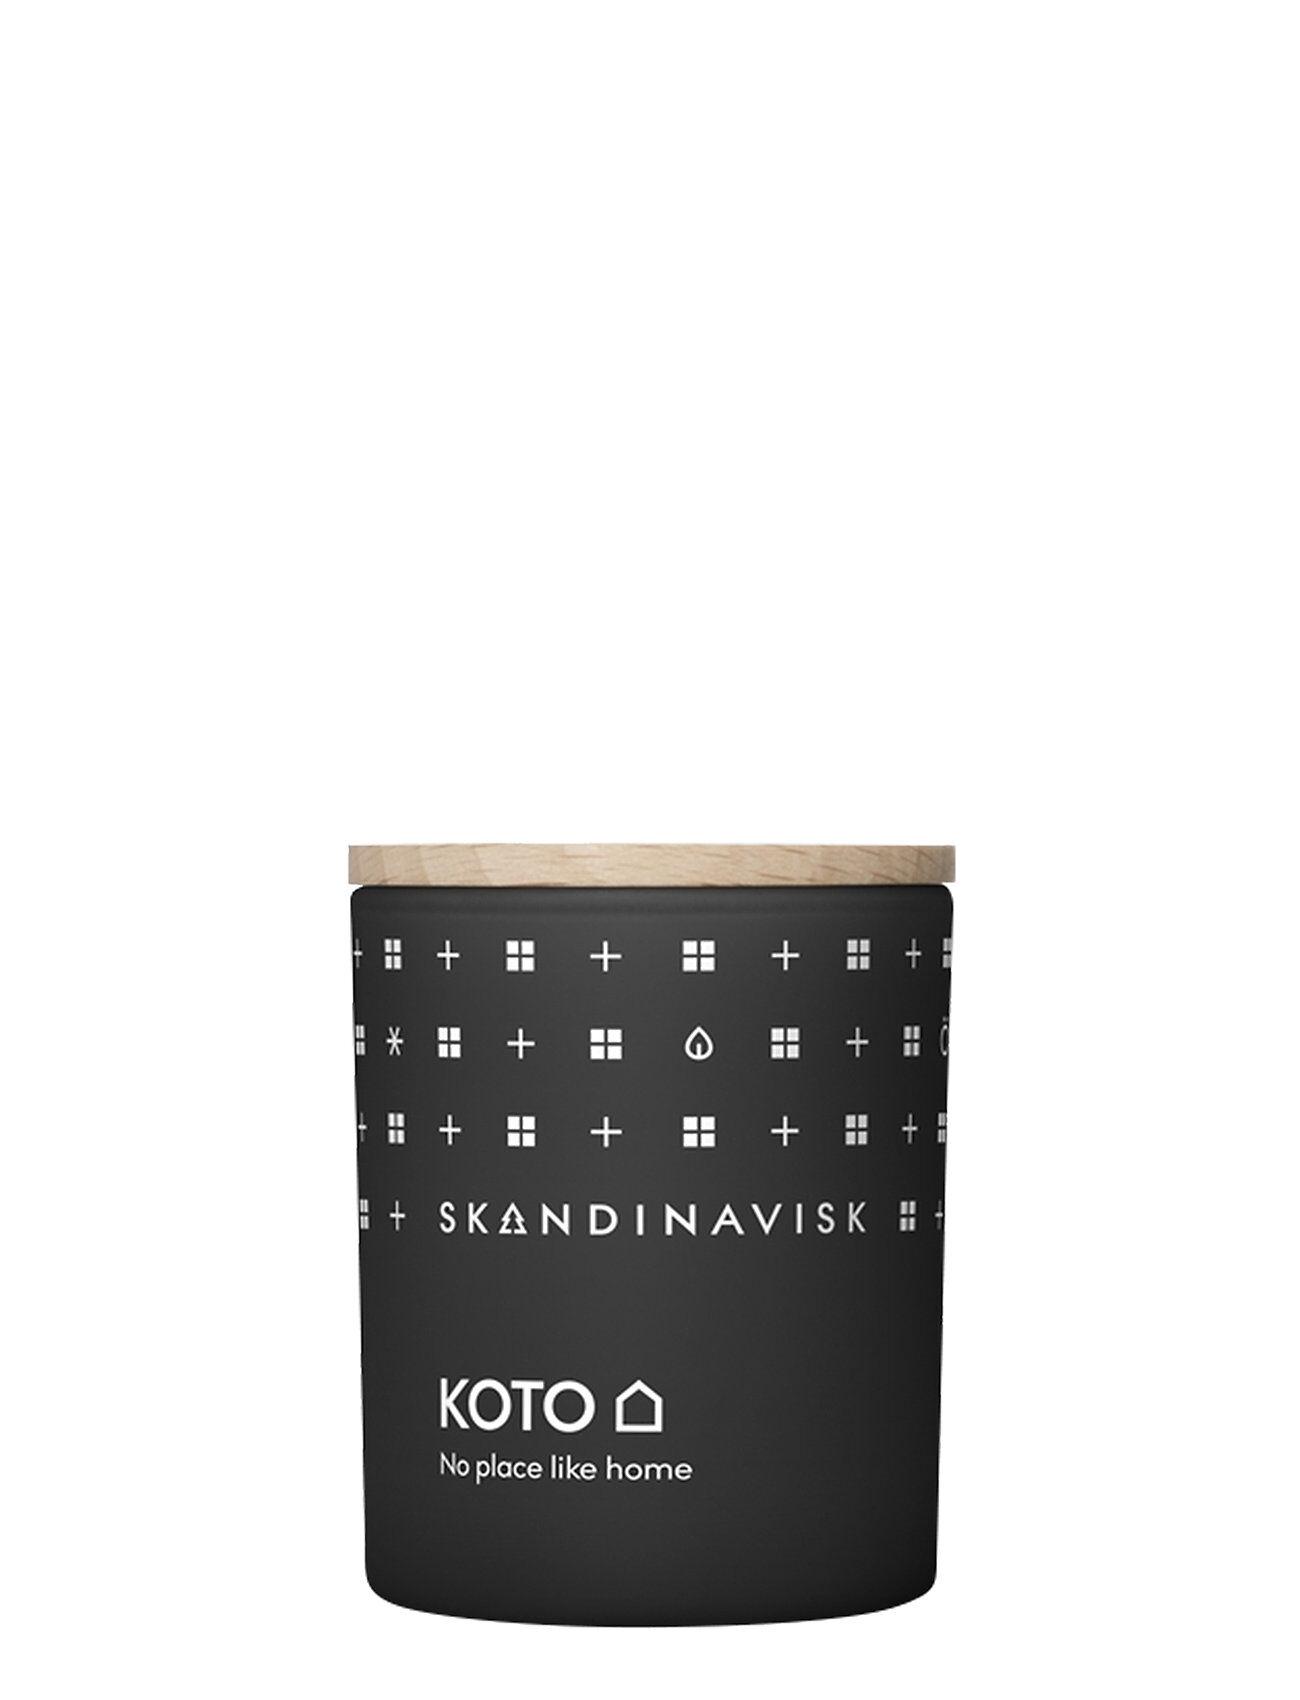 Skandinavisk Koto Scented Candle With Lid 65g Tuoksukynttilä Nude Skandinavisk